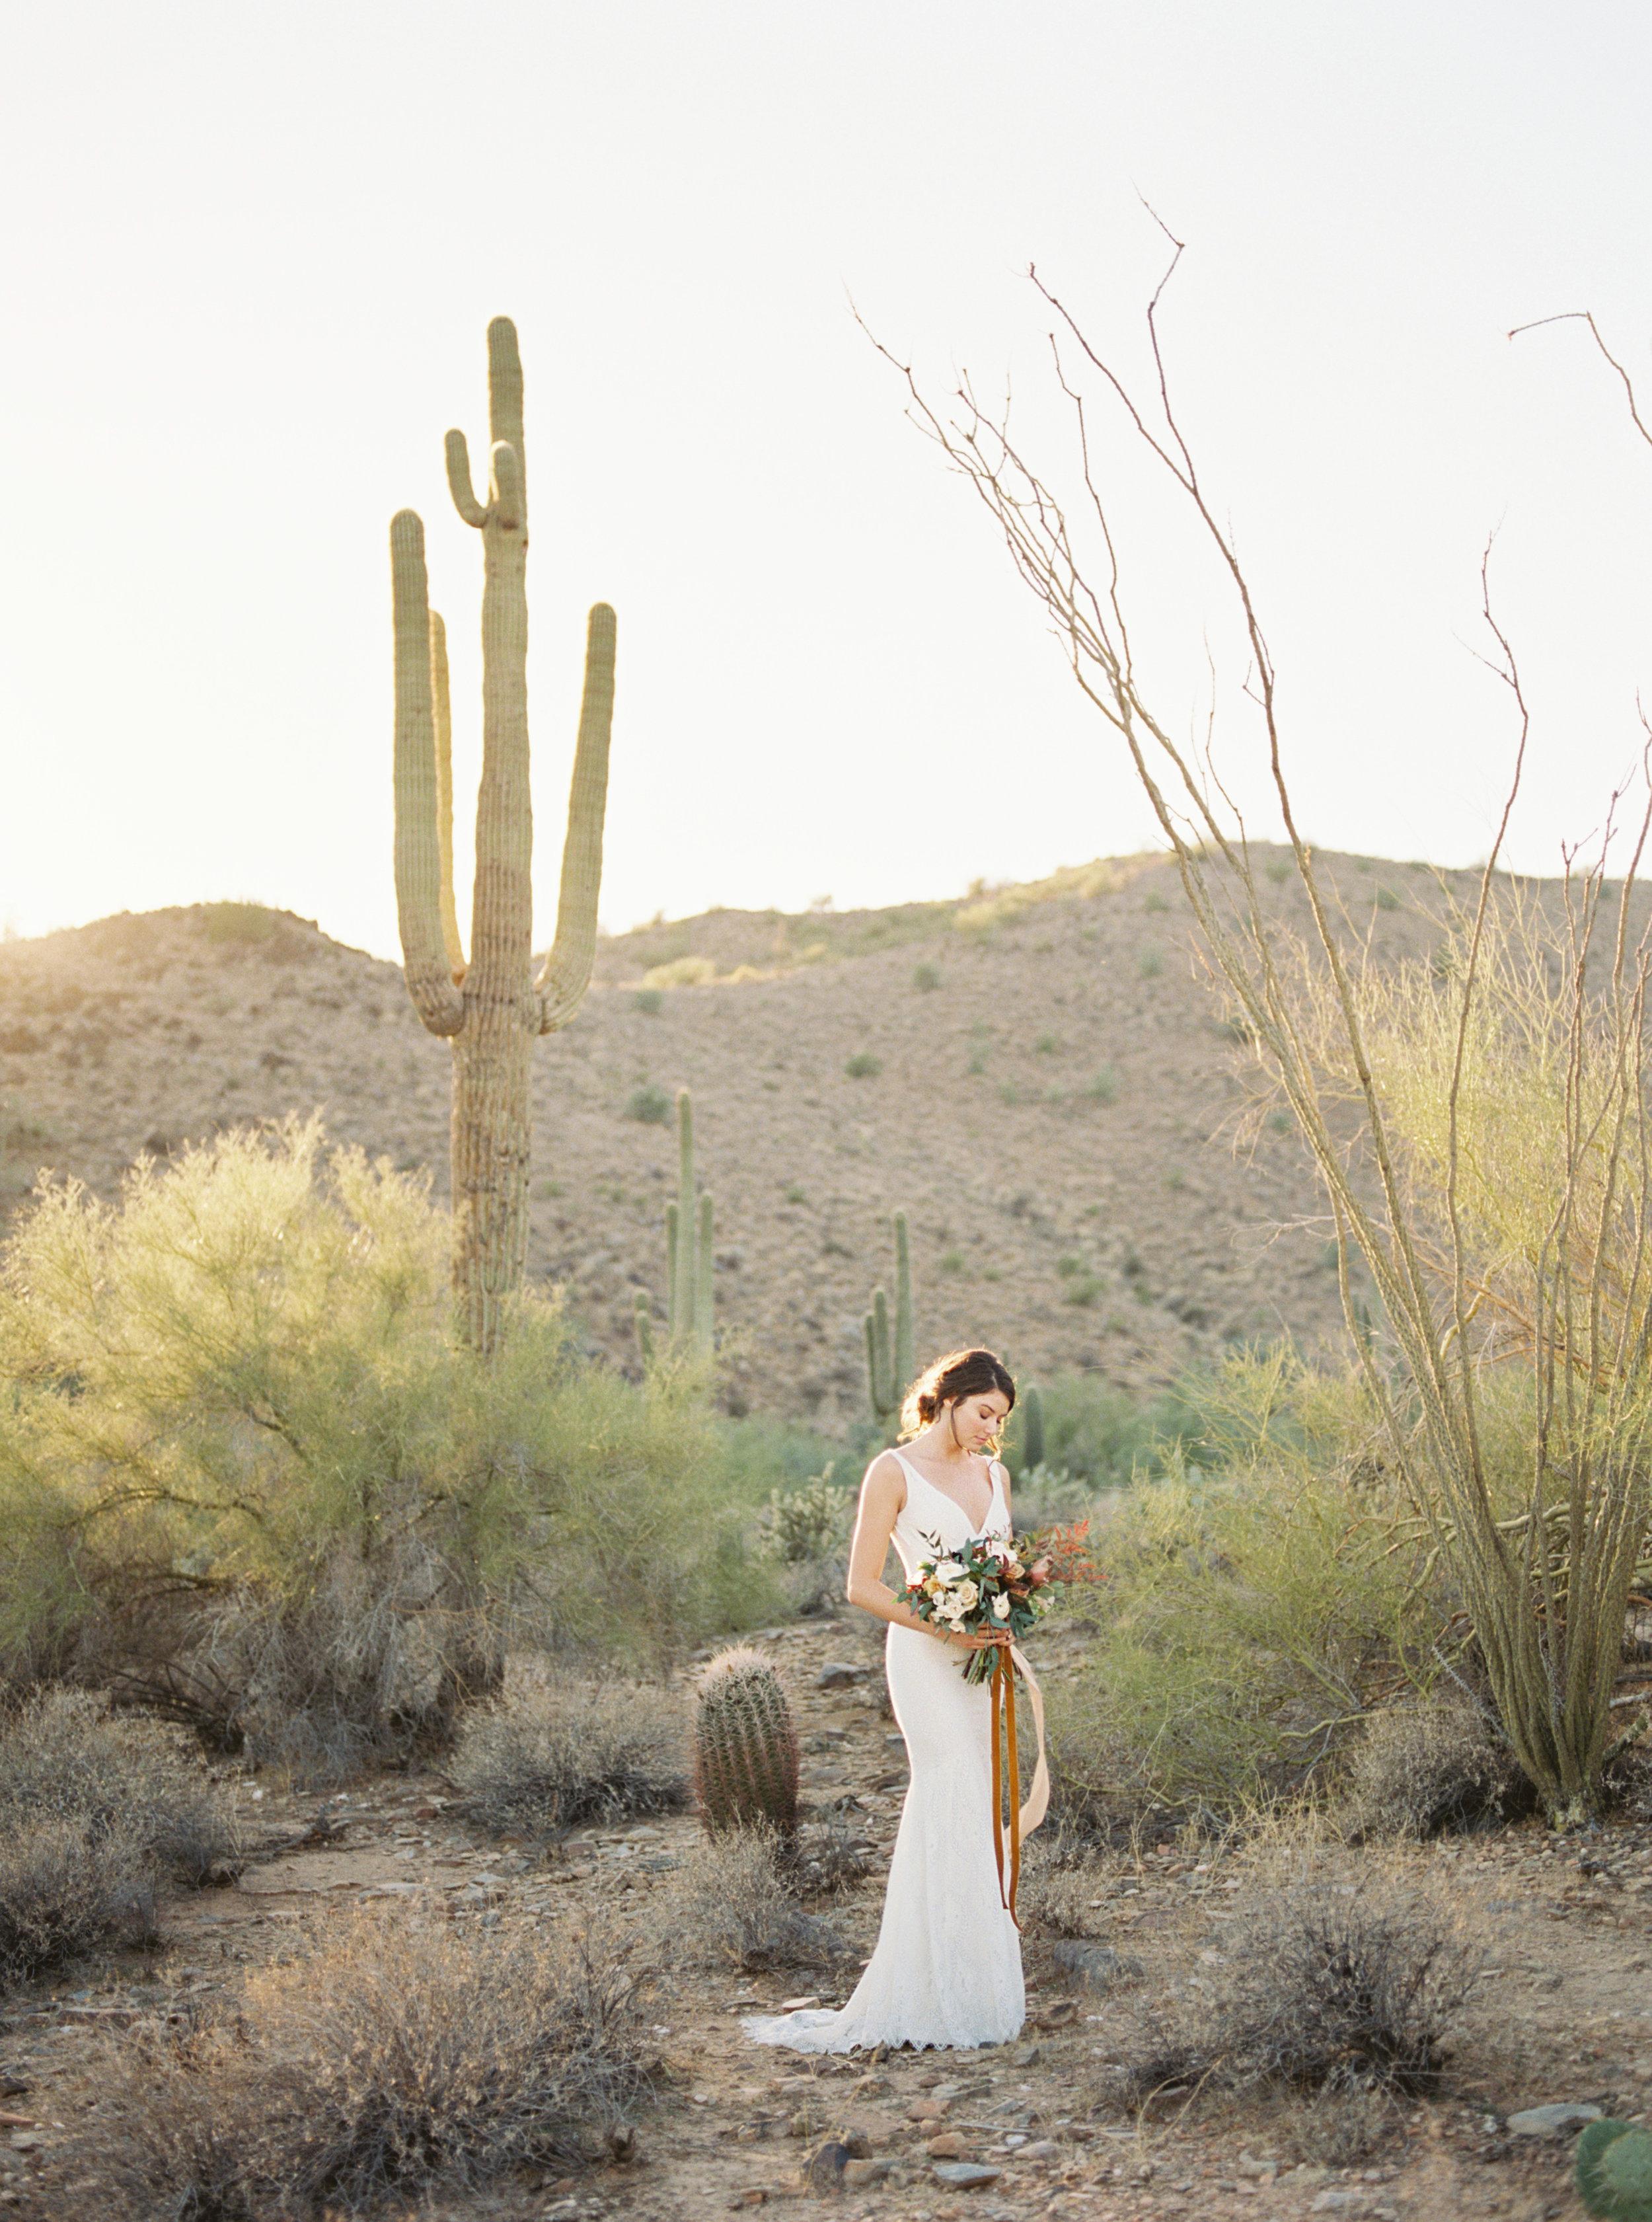 TaraBielecki_Arizona_Editorial25.jpg